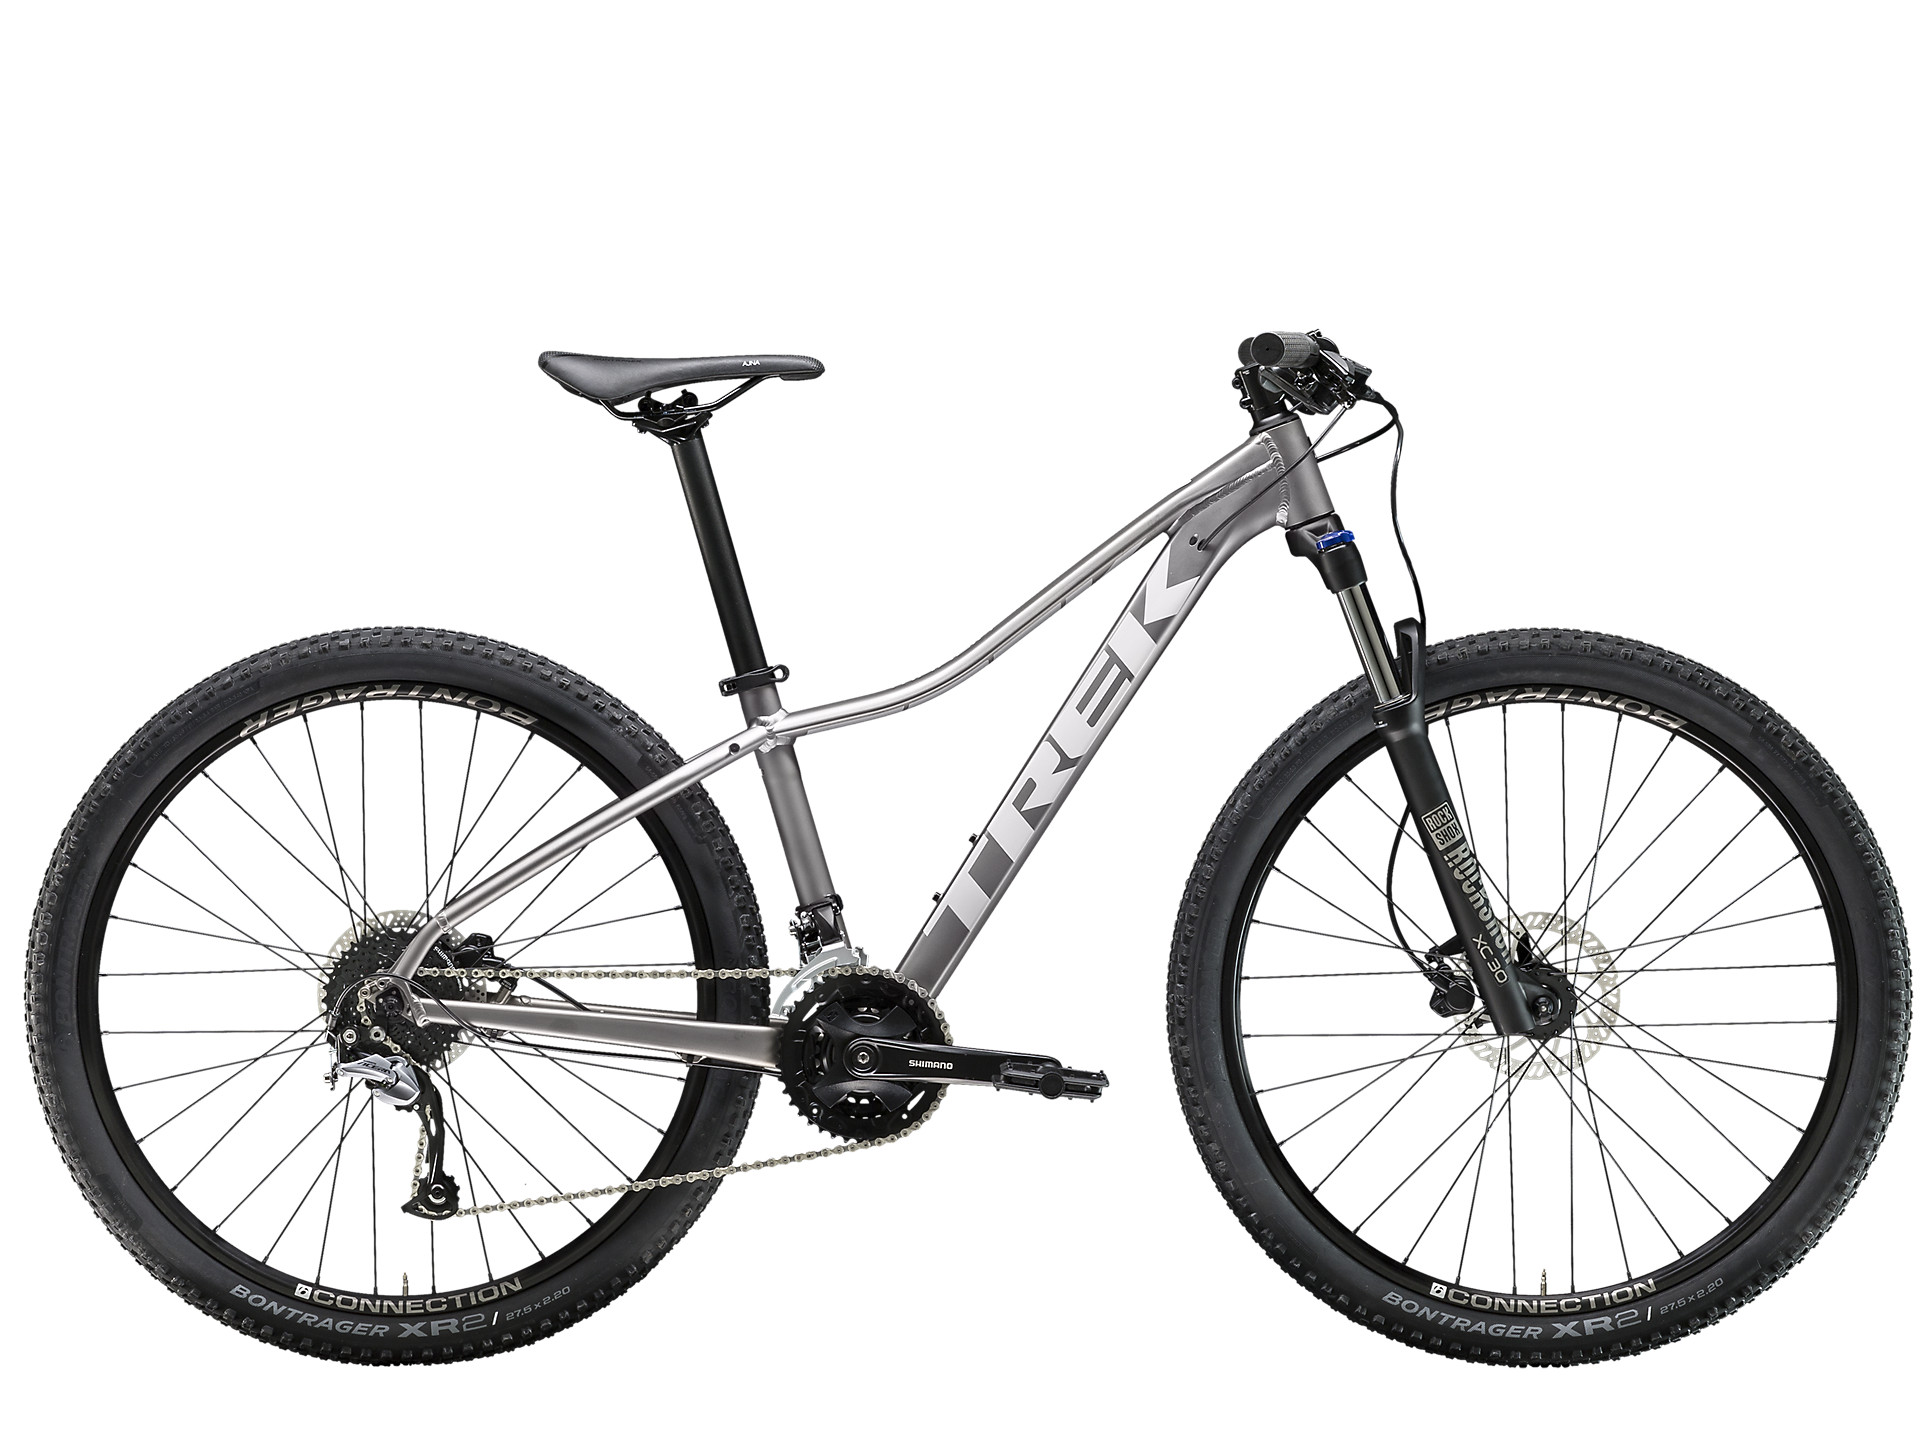 a02de3a06 Marlin | Trek Bikes